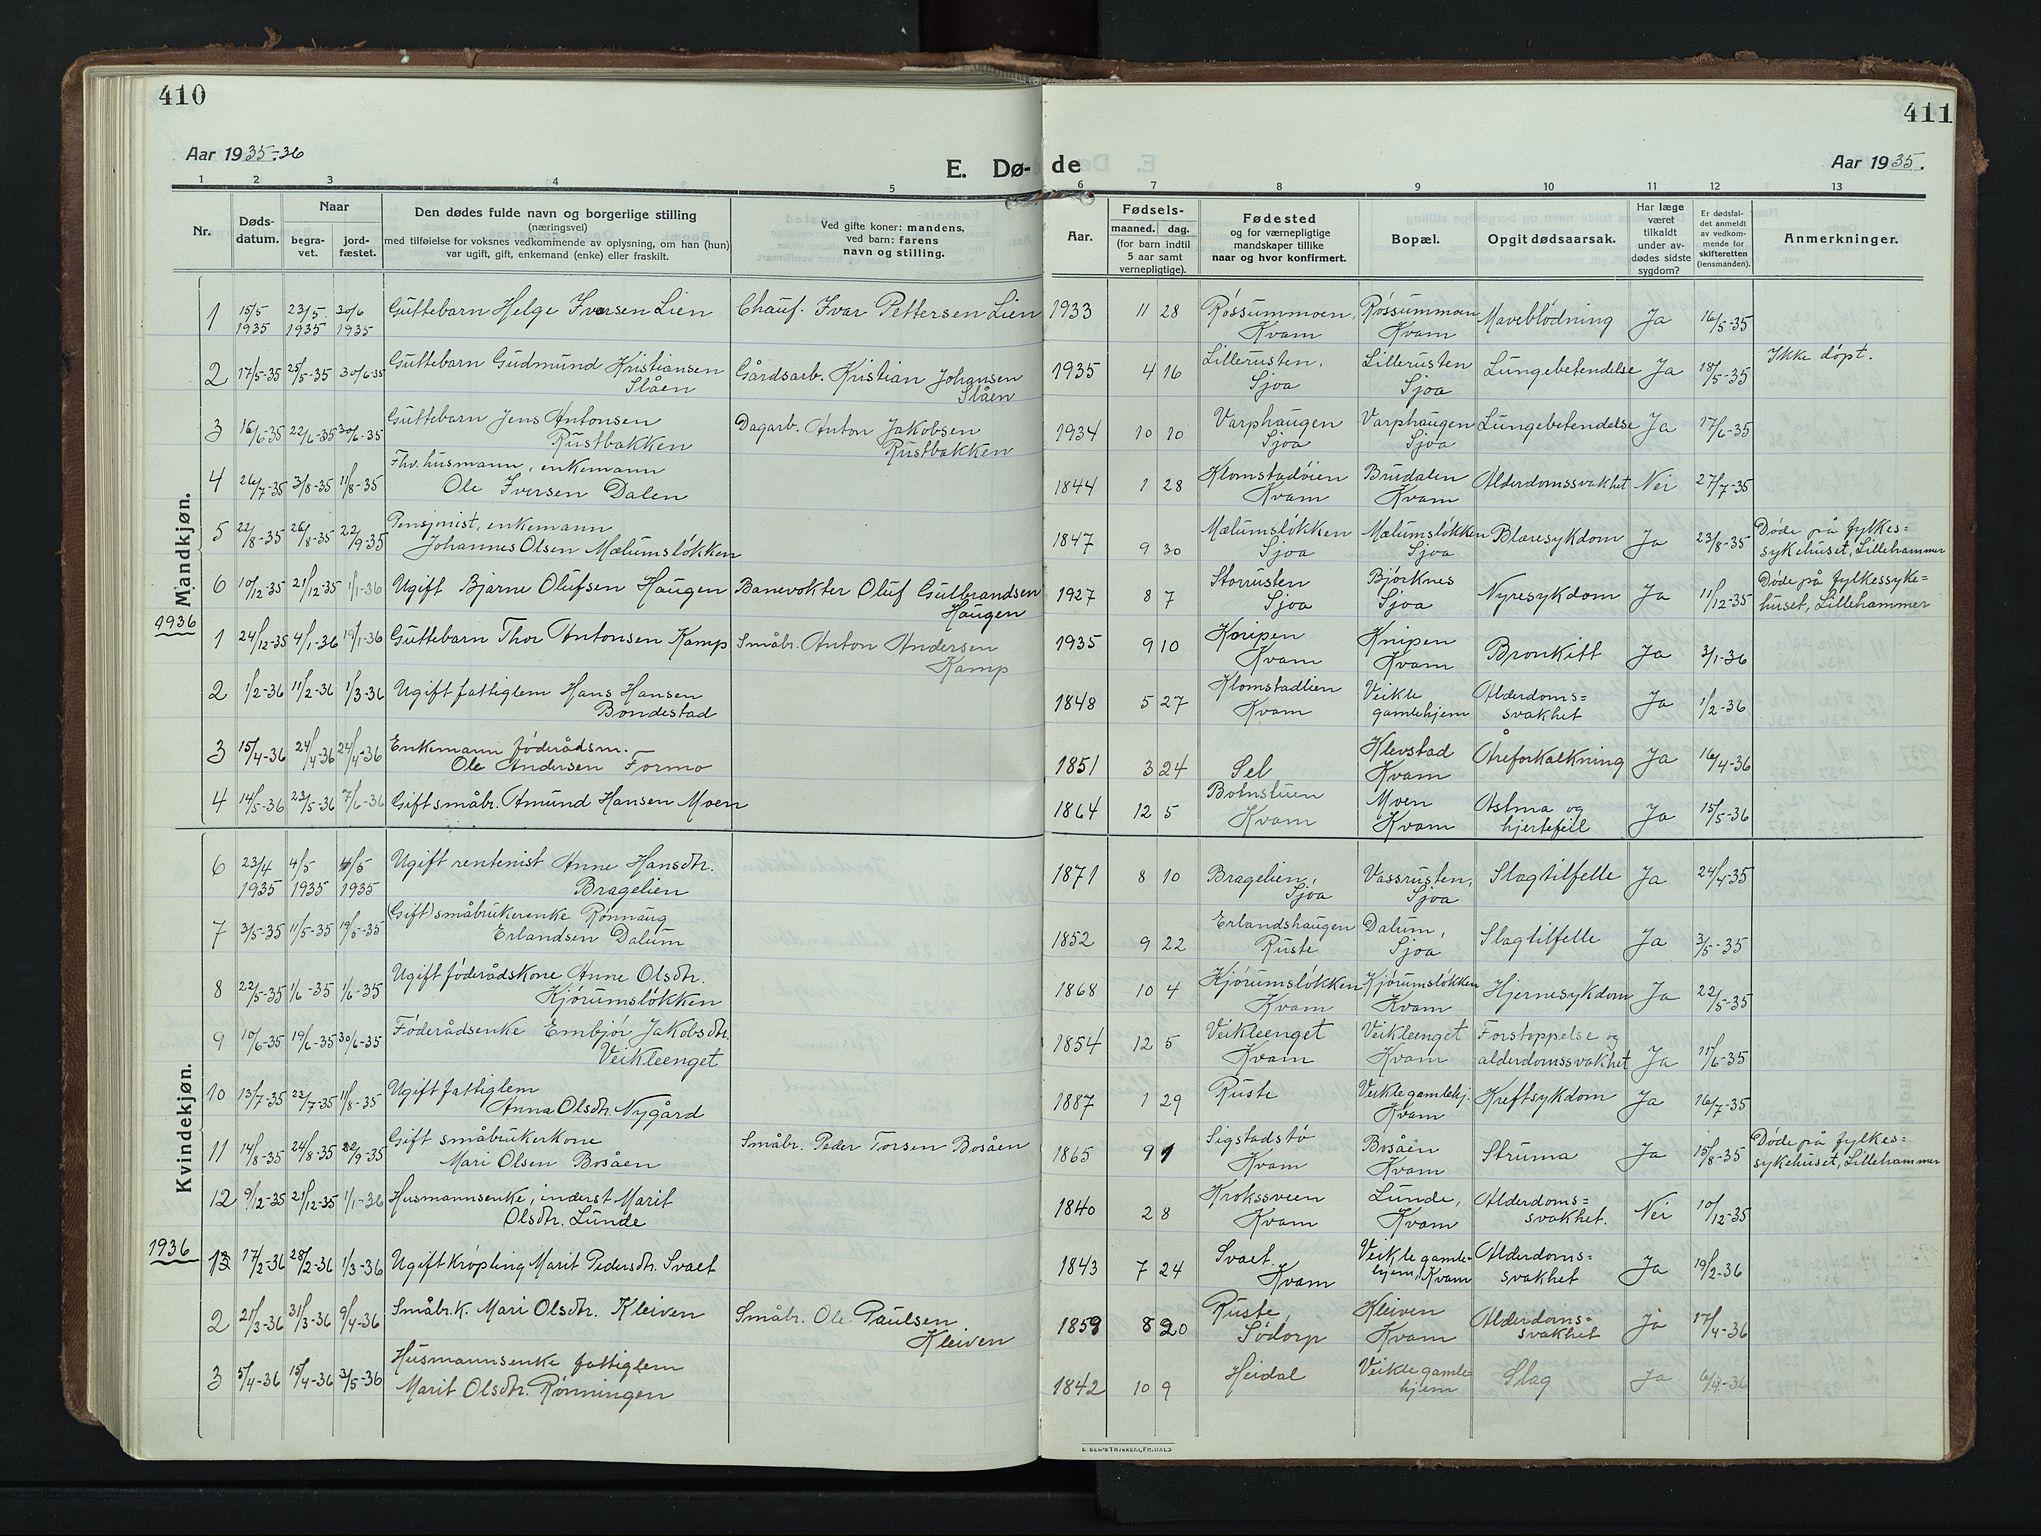 SAH, Nord-Fron prestekontor, Klokkerbok nr. 8, 1915-1948, s. 410-411